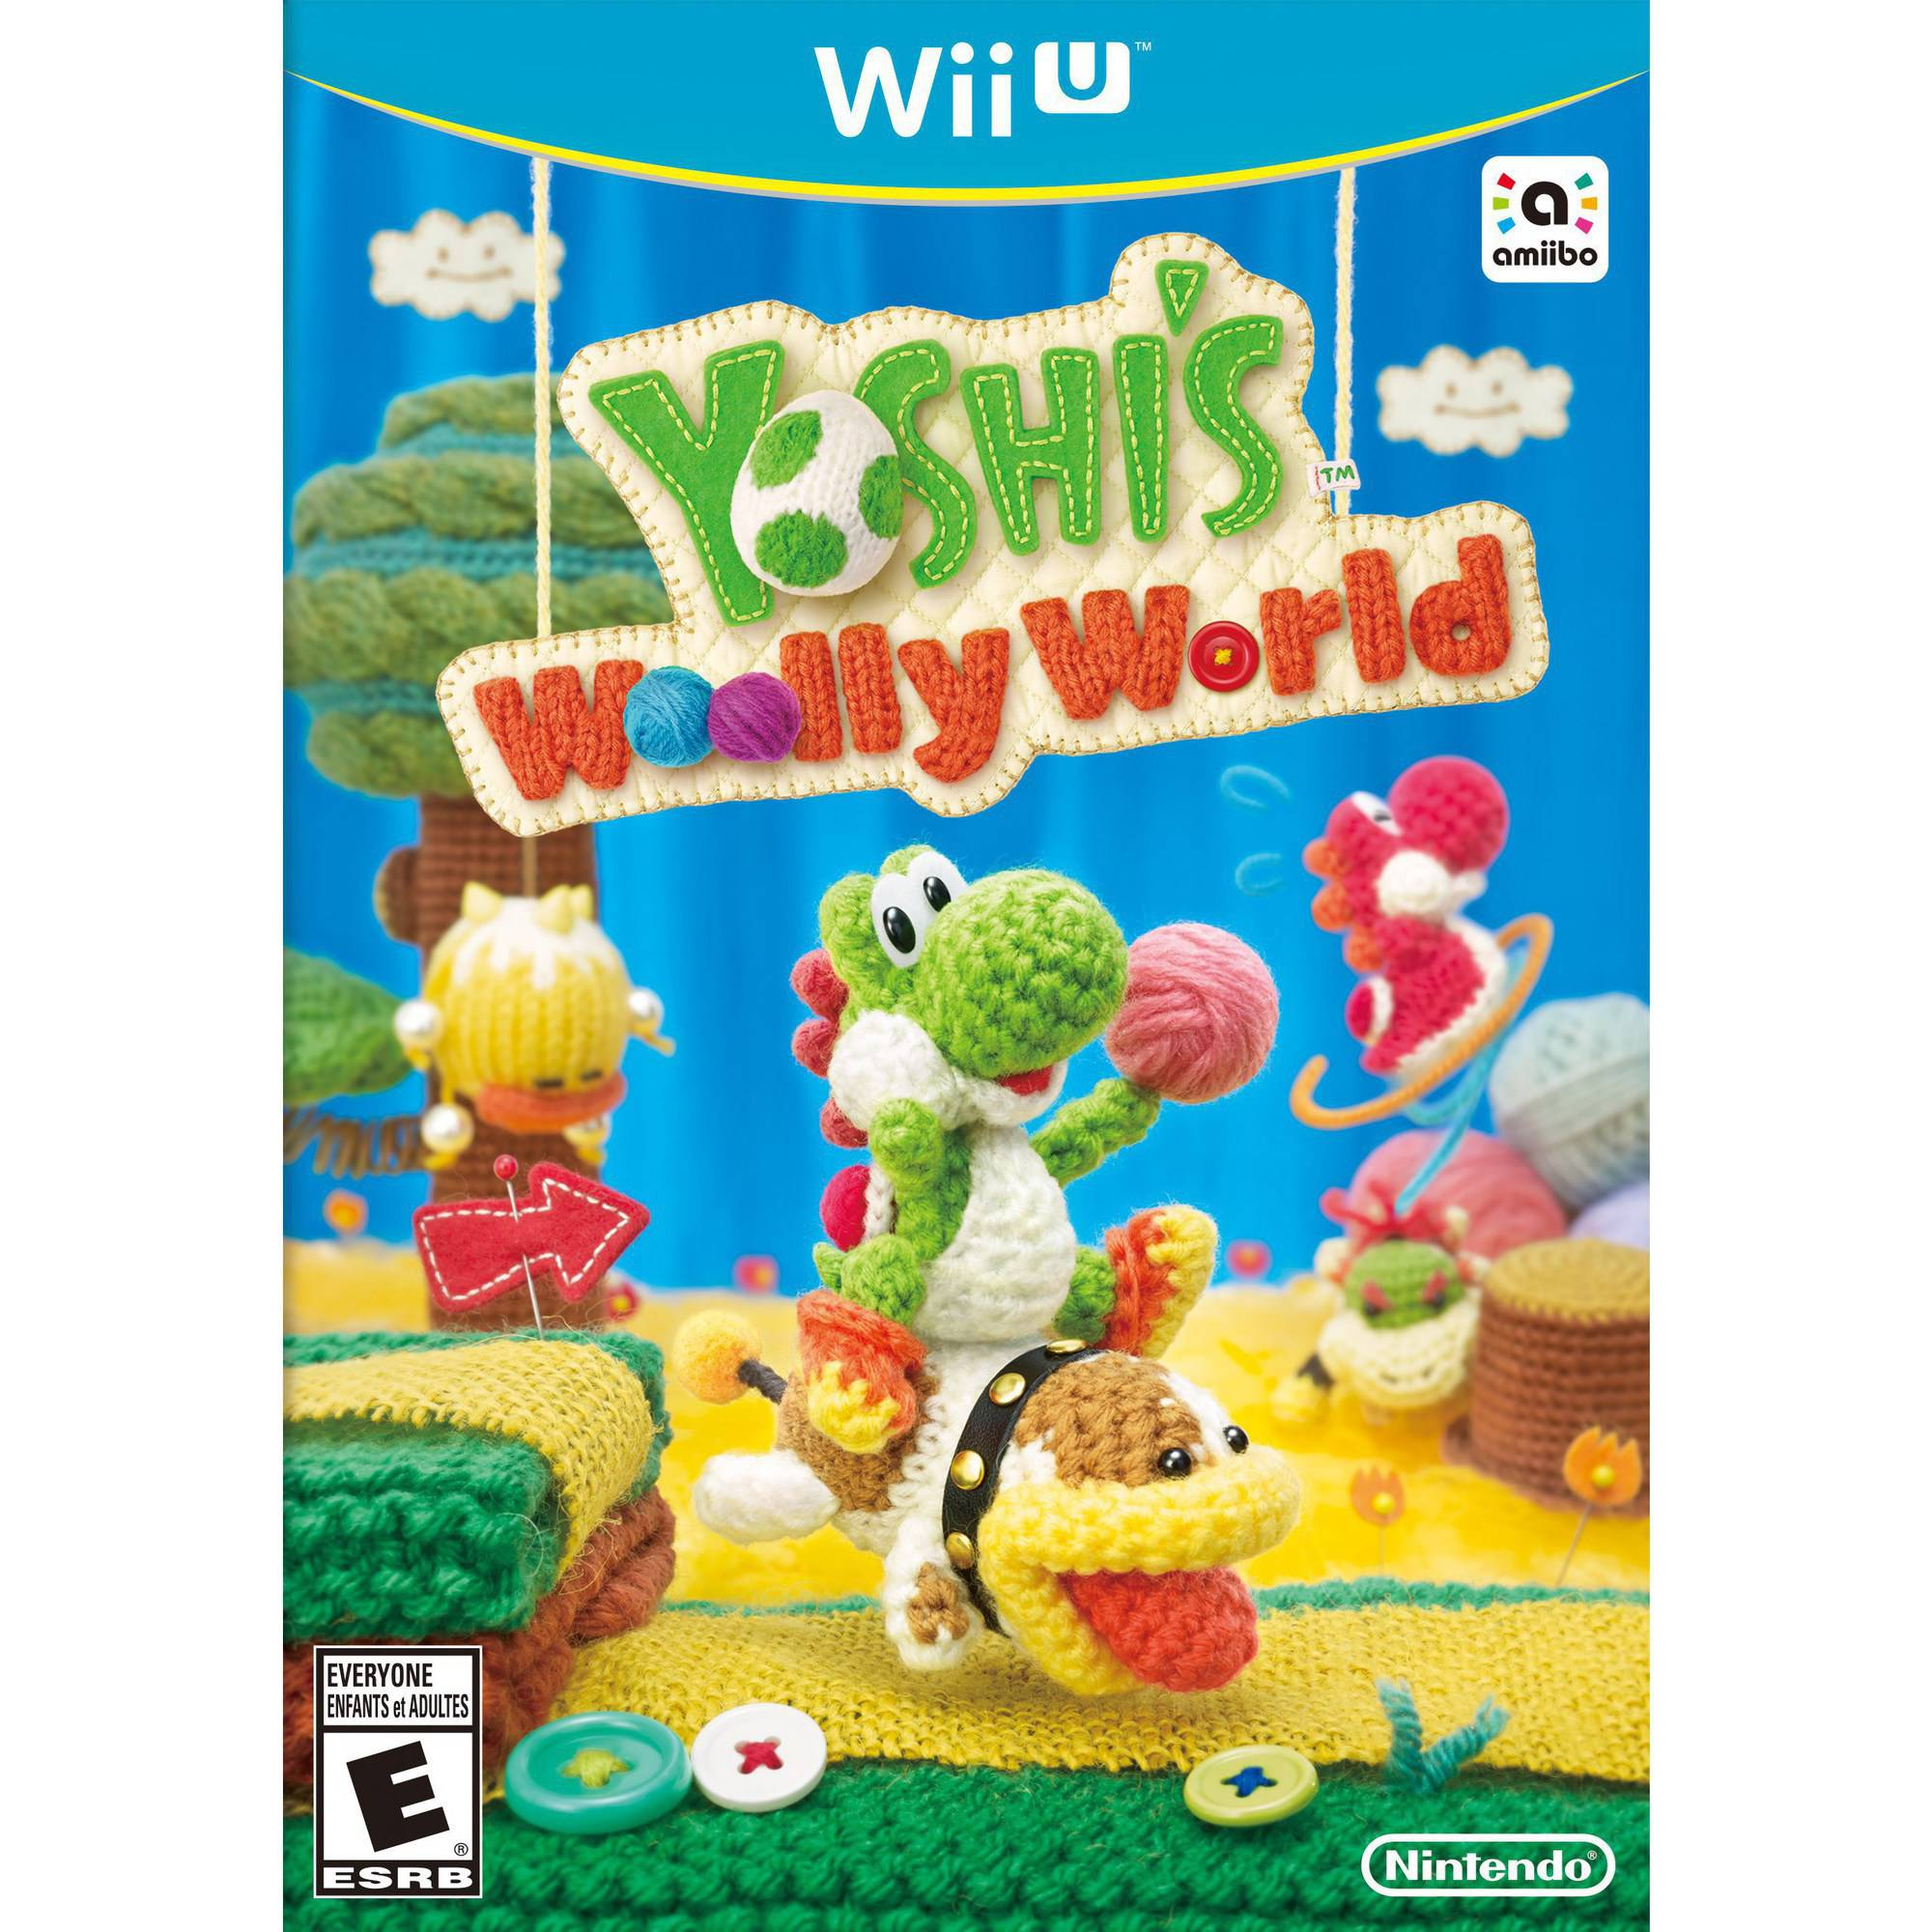 Yoshi Woolly World (Wii U)